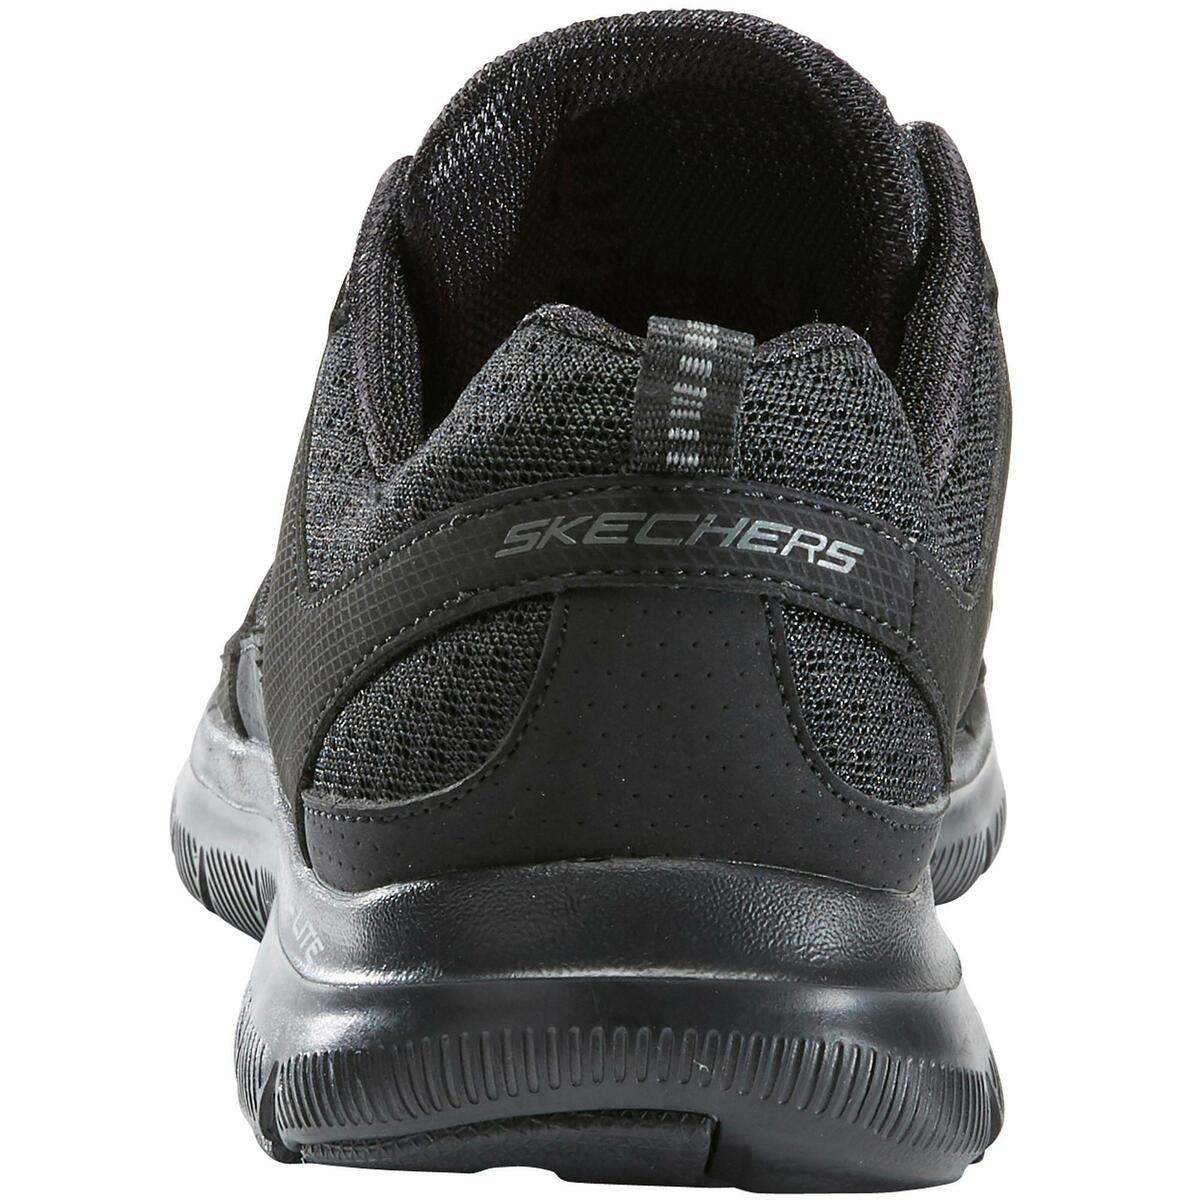 Bild 4 von Walkingschuhe Flex Dual Lite Damen schwarz